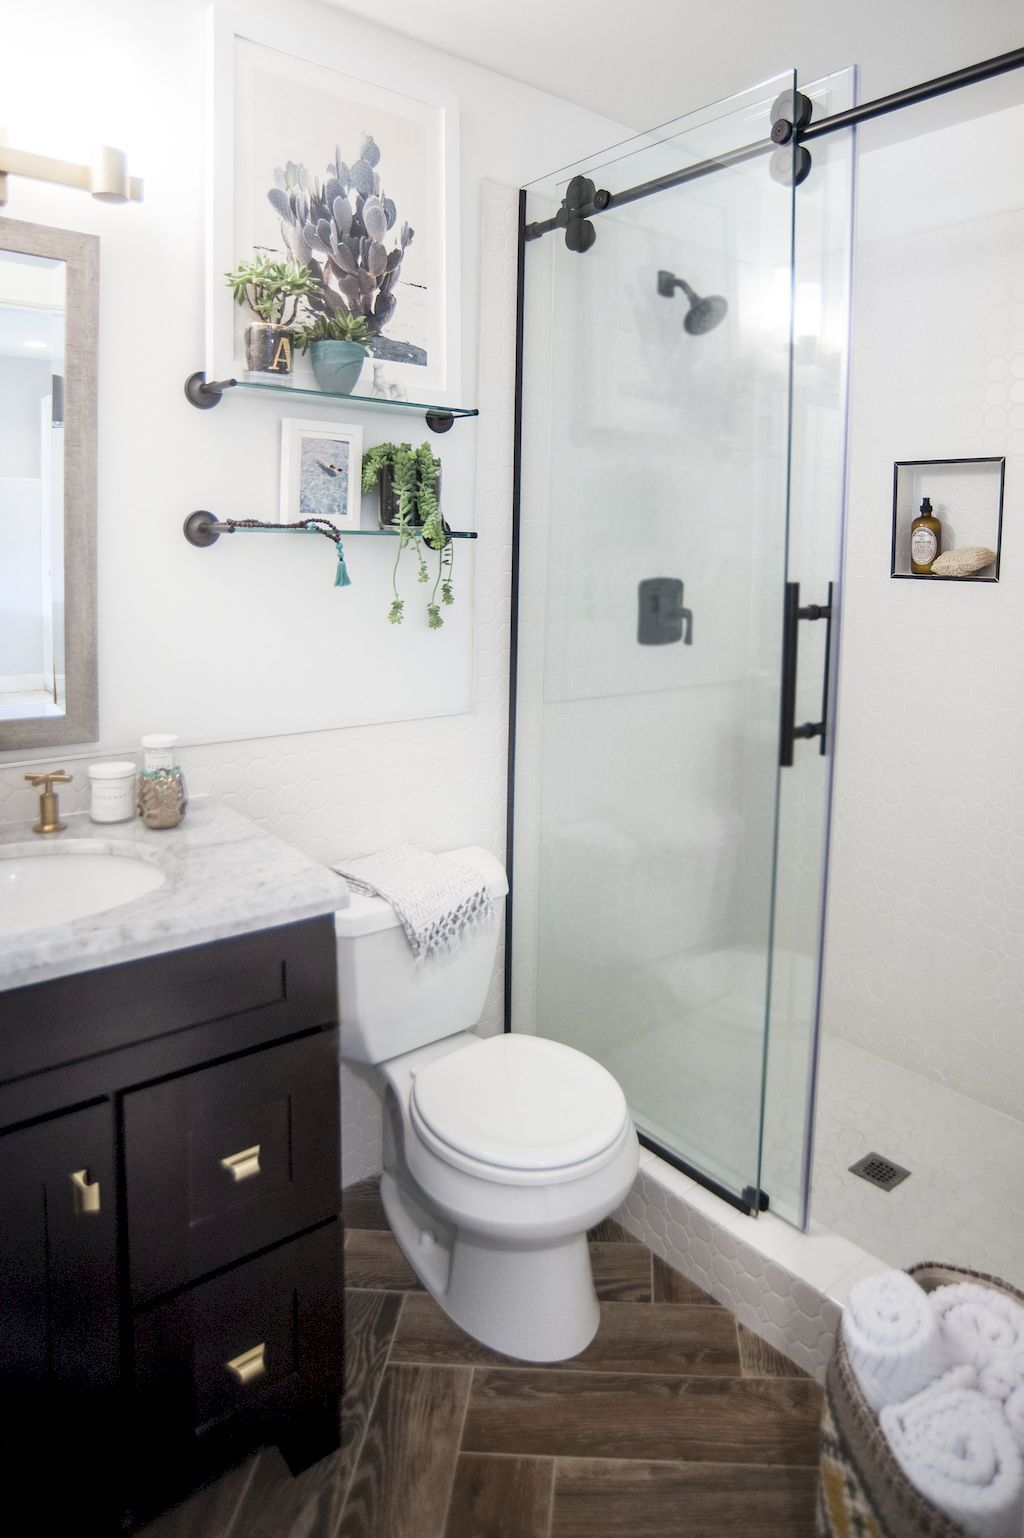 Cool Small Master Bathroom Remodel Ideas 31 Bathroom Ideas - Small-master-bathroom-ideas